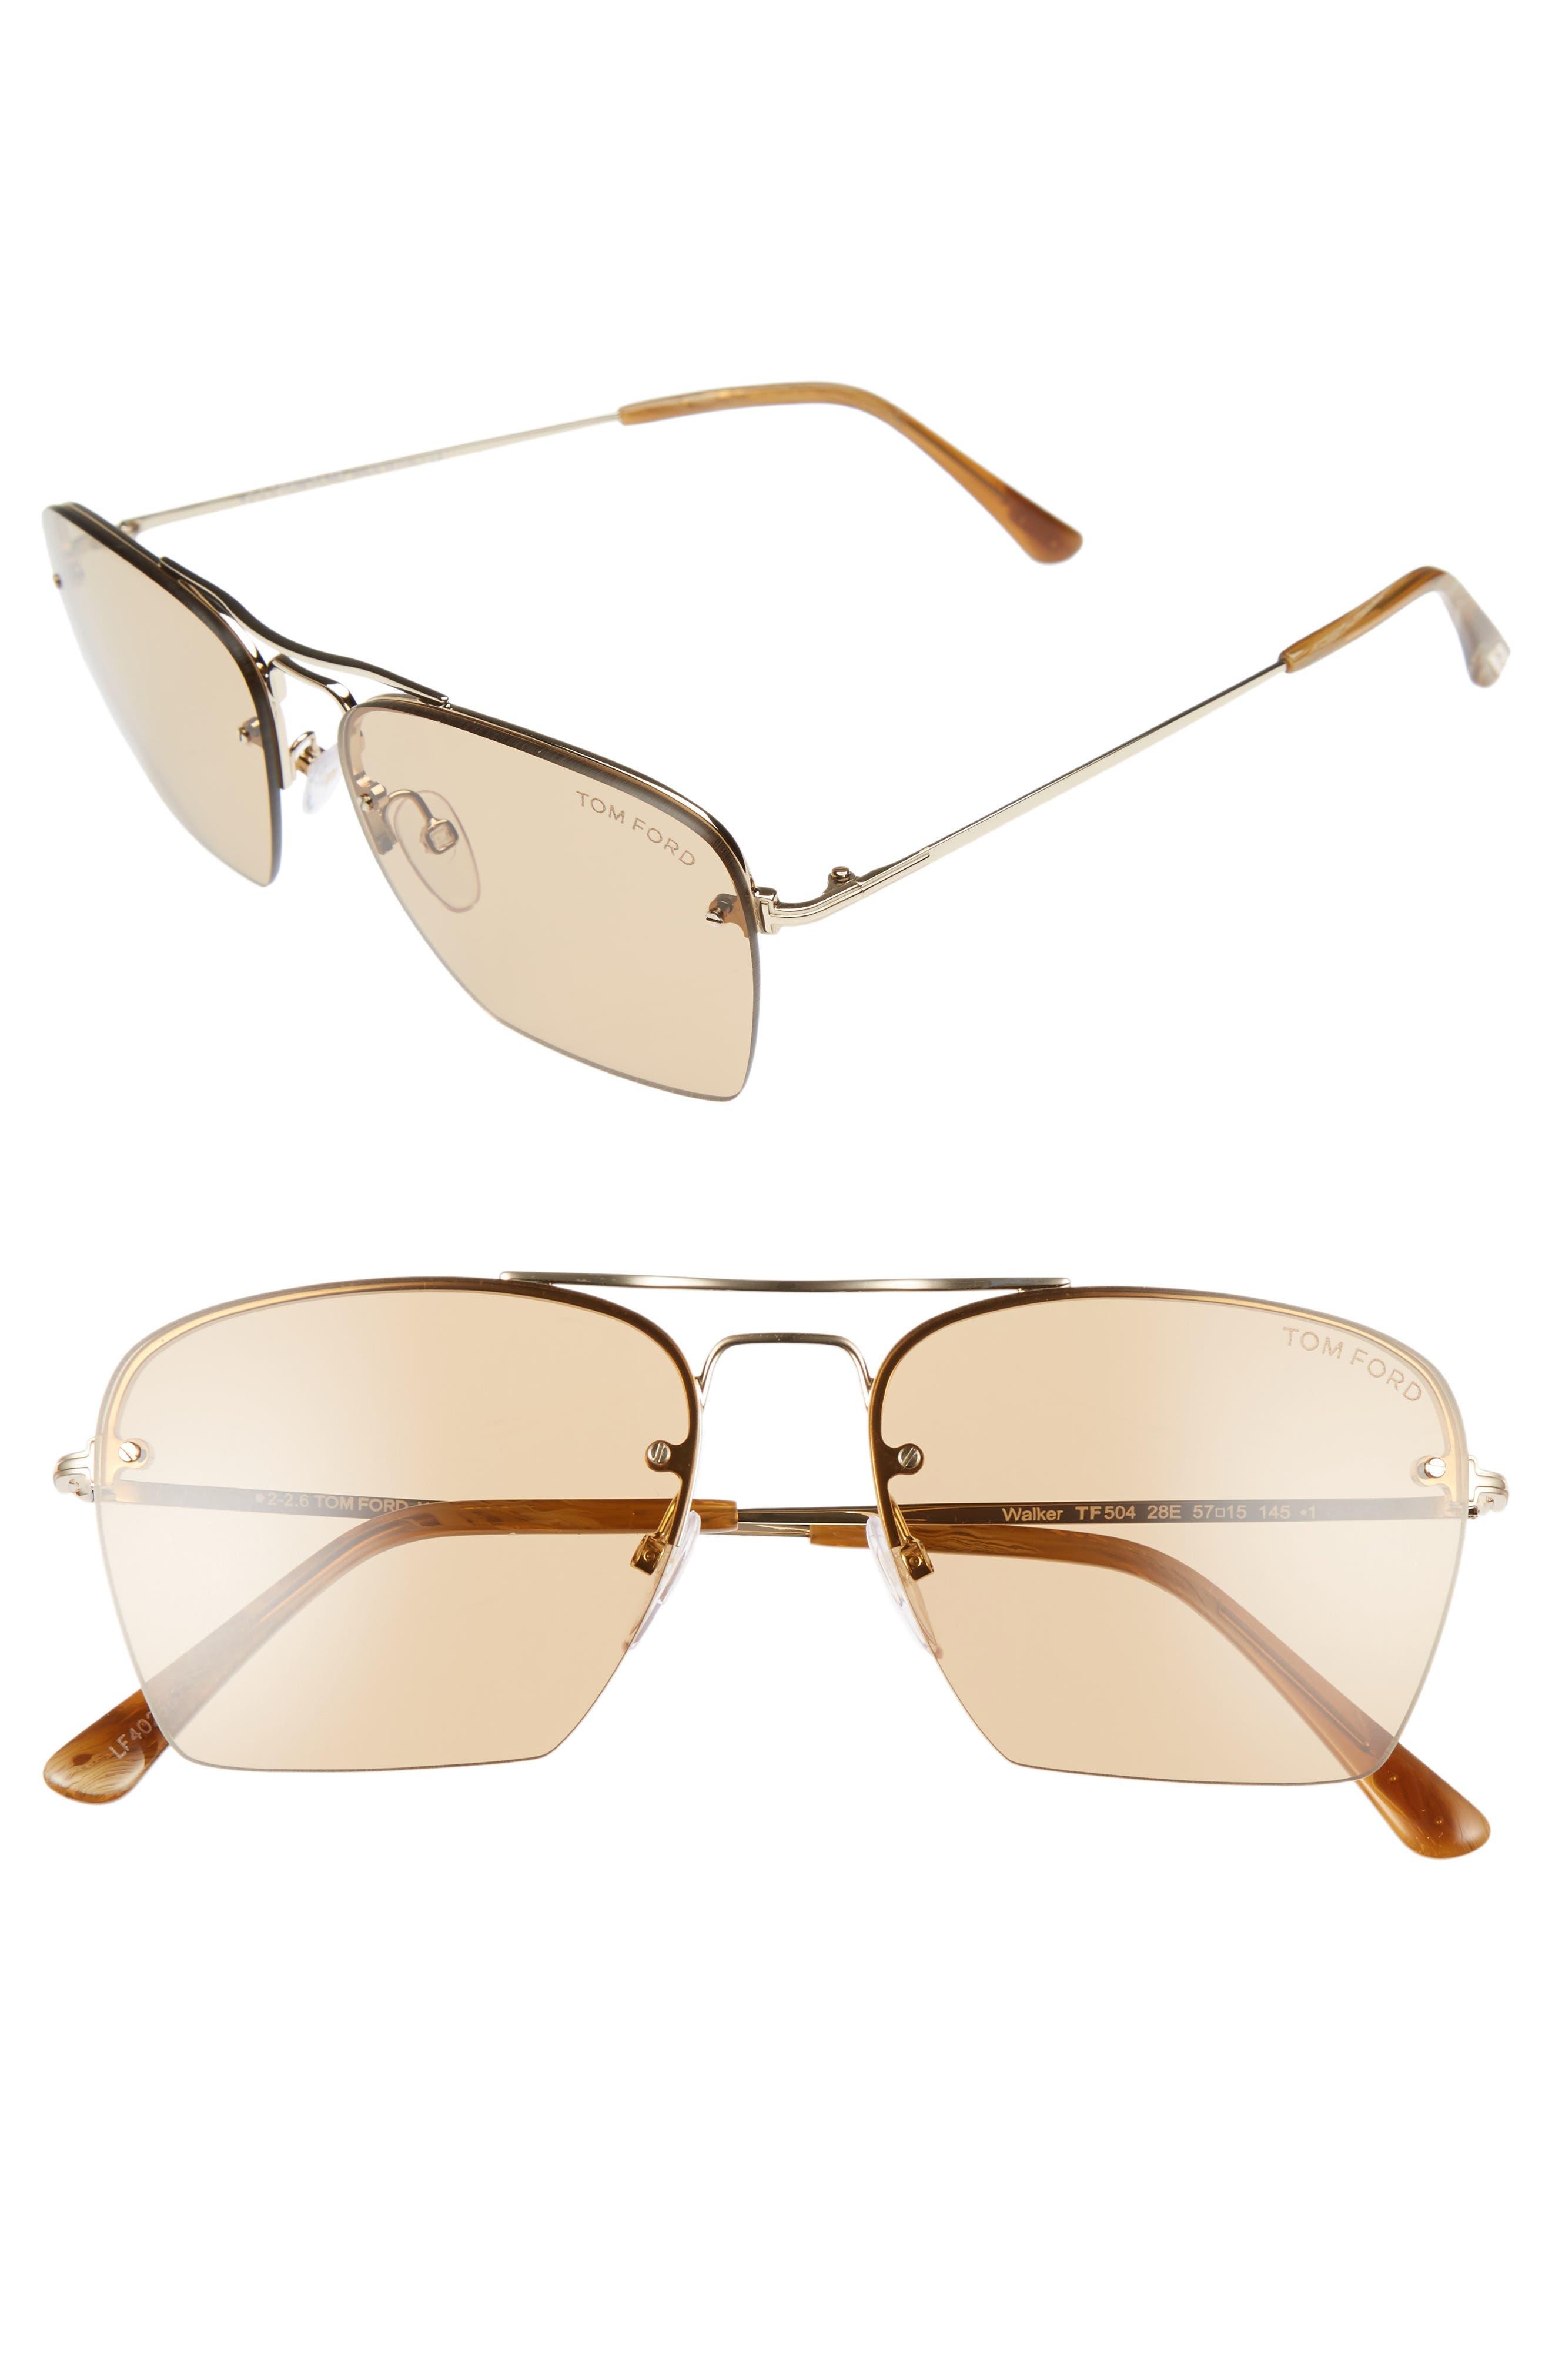 Walker 57mm Semi Rimless Square Sunglasses,                             Main thumbnail 1, color,                             710